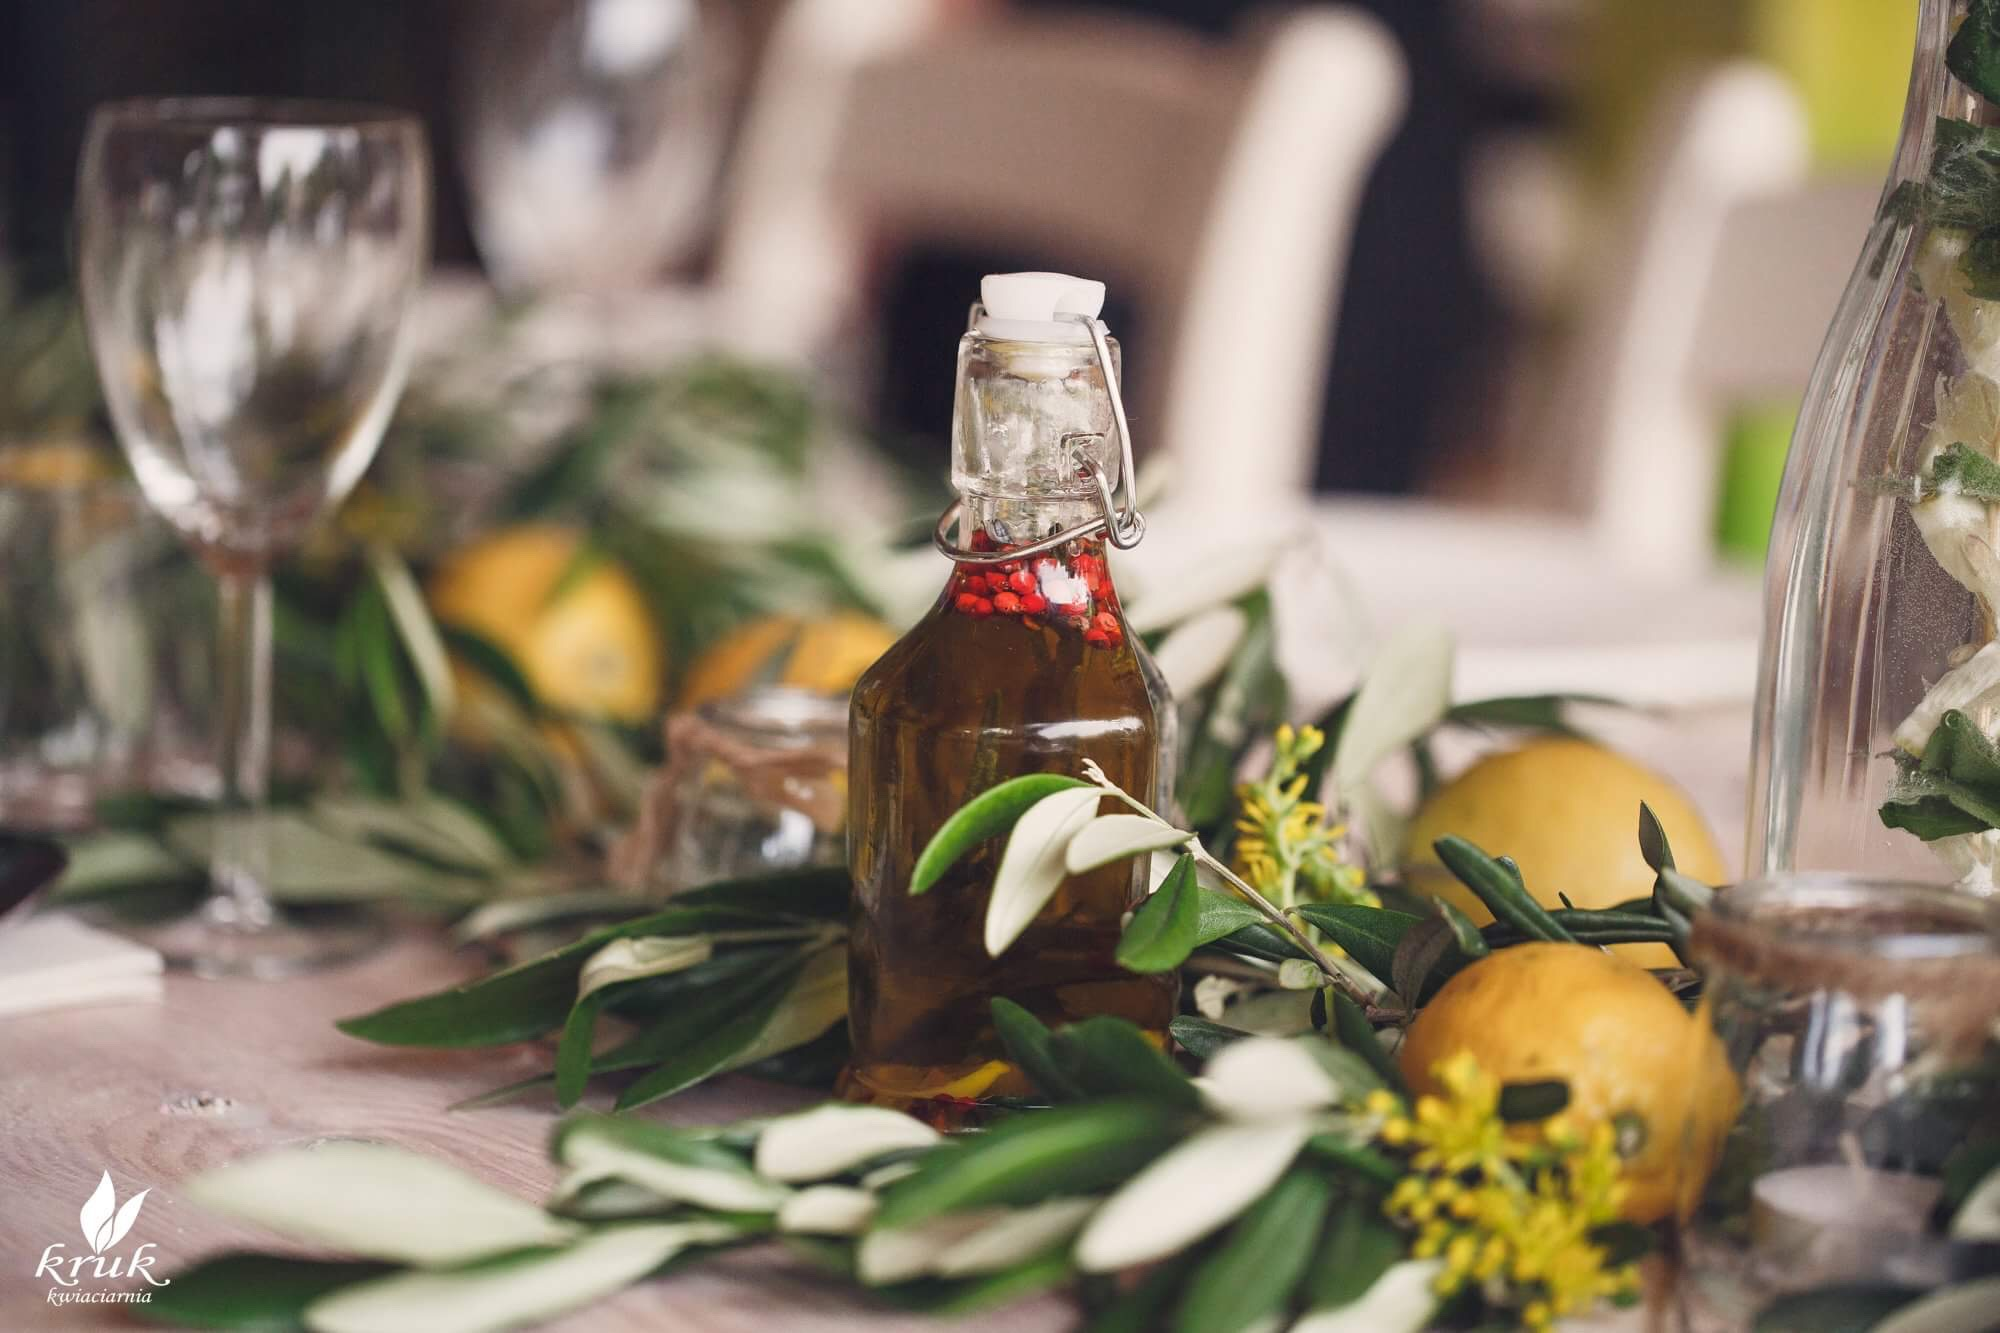 Cytrynowy zapach Włoch